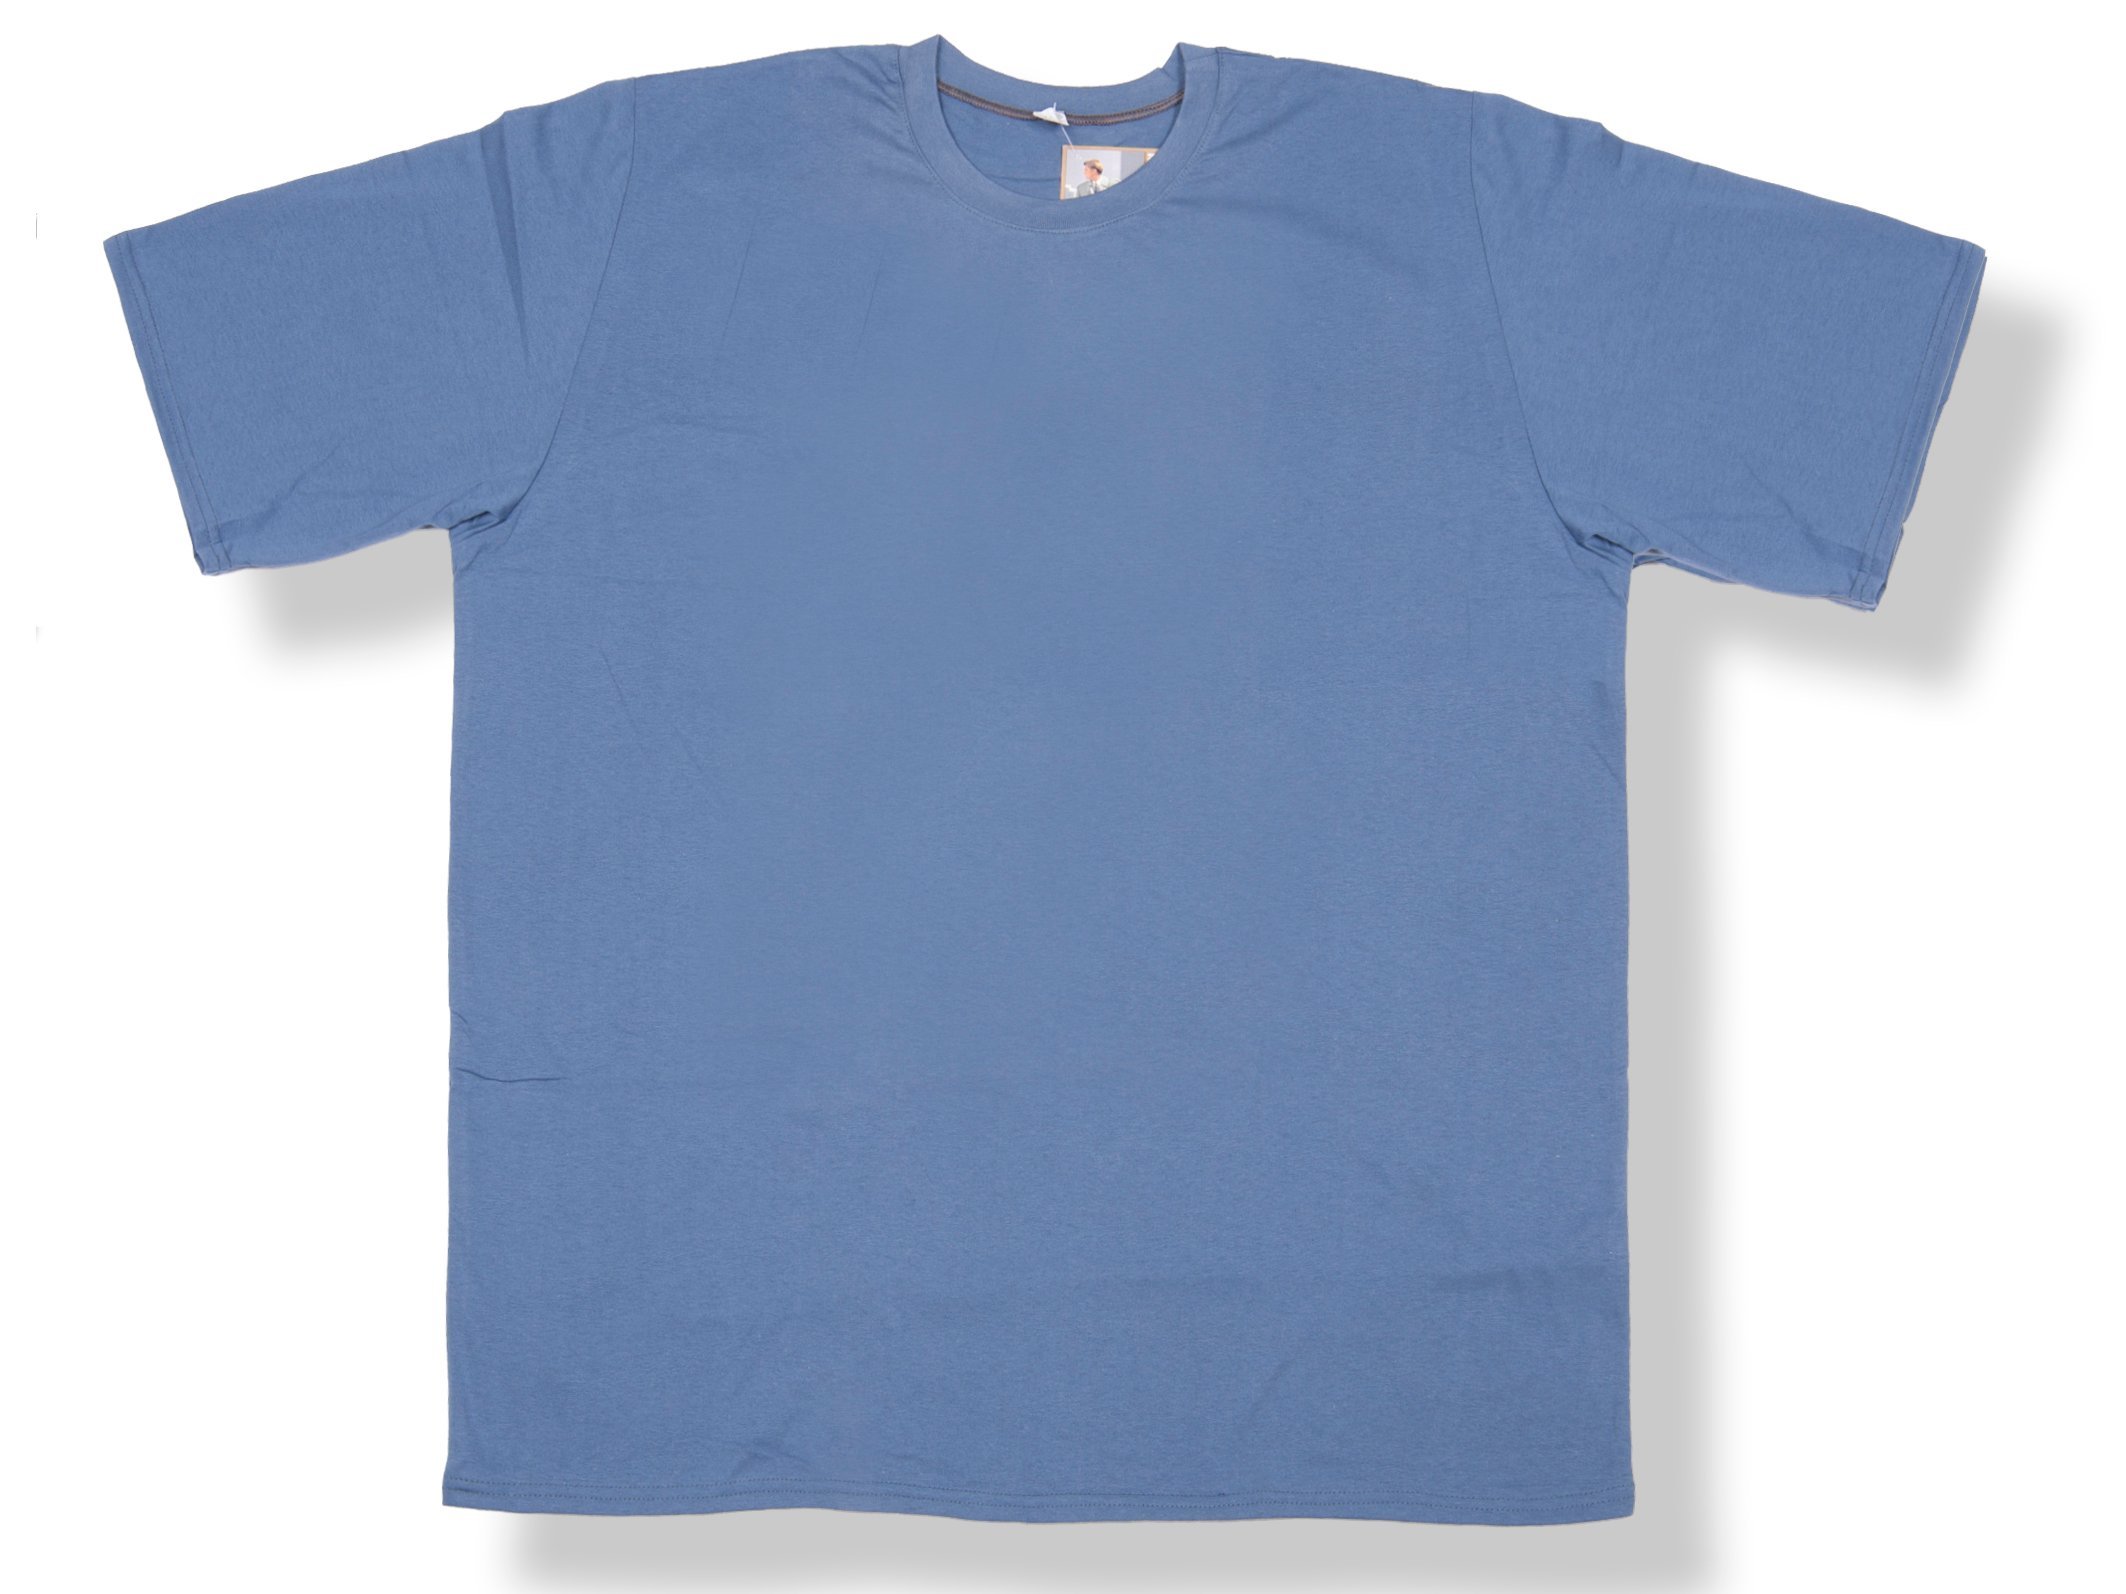 Koszulka T shirt Męski duży rozmiar 7XL niebieska 7463604906